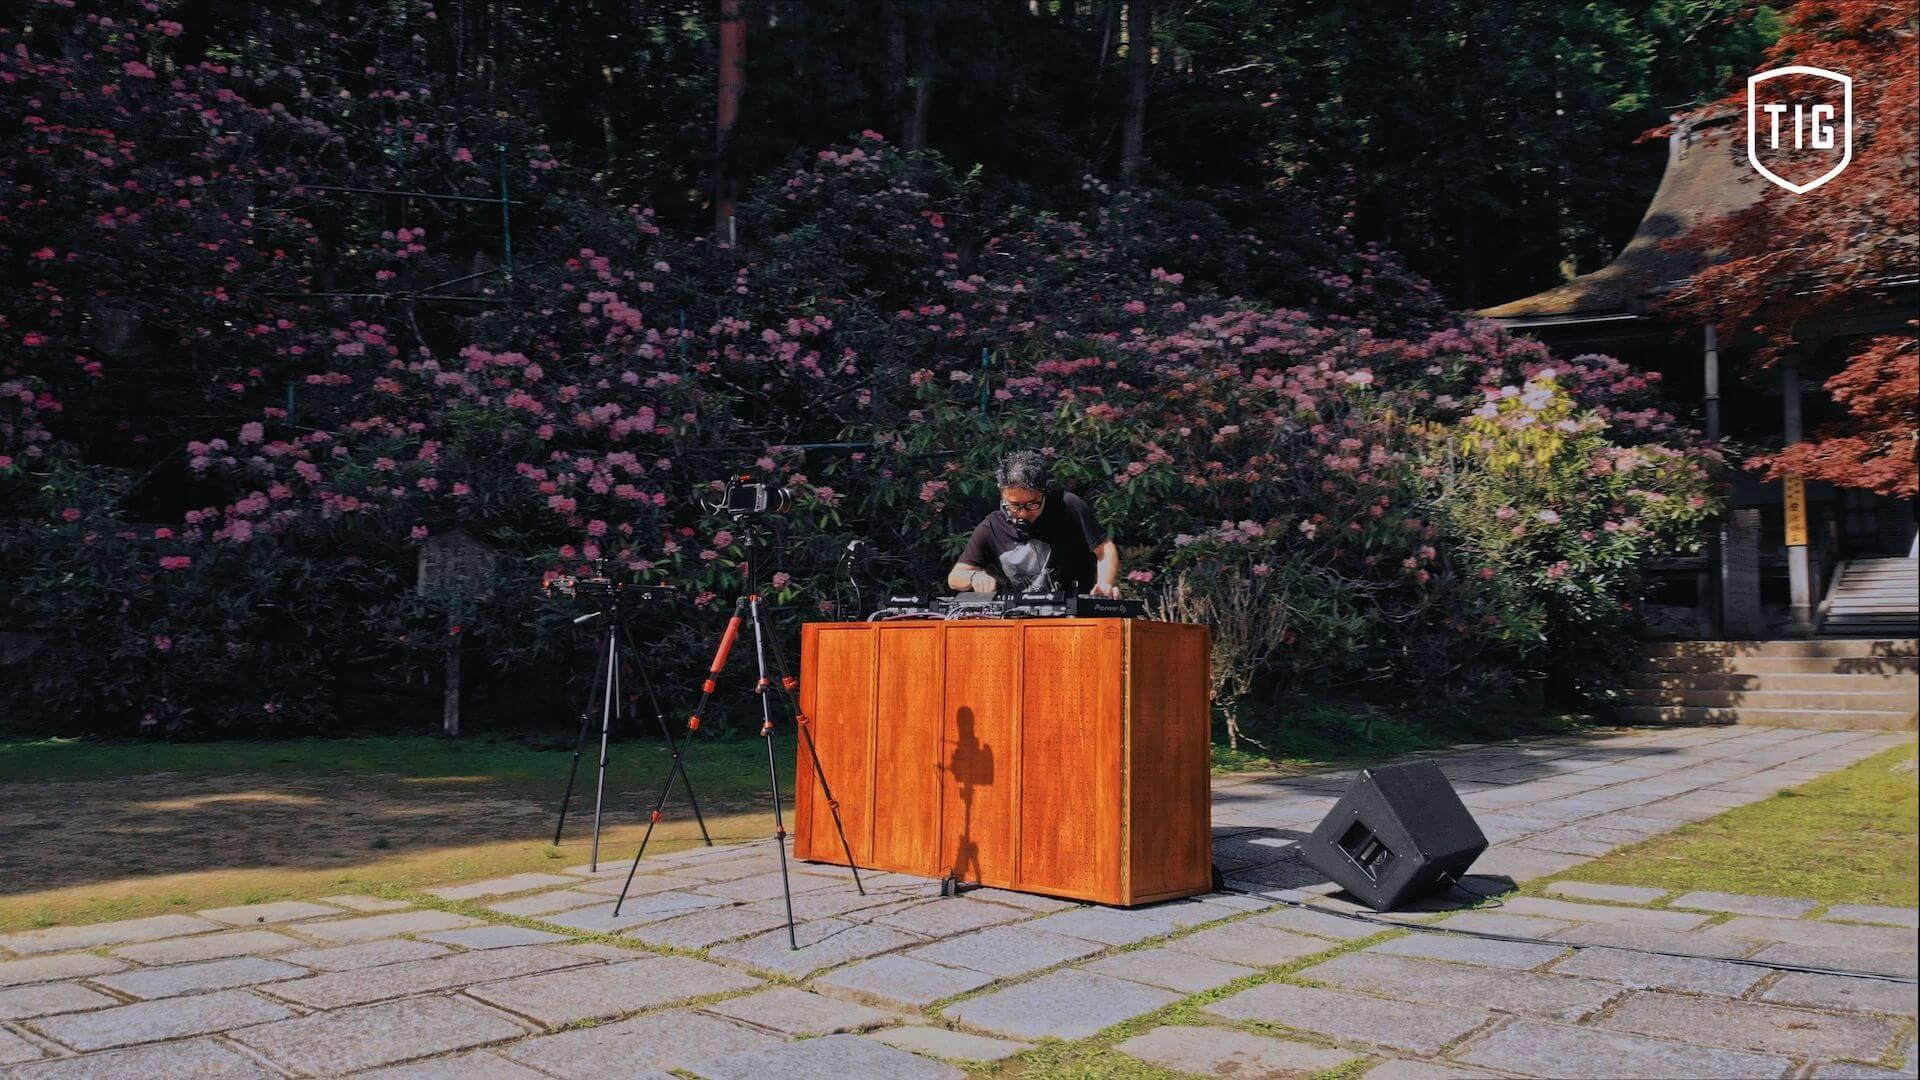 Tsuyoshi Suzukiが高野山金剛三昧院でDJを披露する「密教トランス」映像が公開 music210730-tsuyoshi-suzuki-5